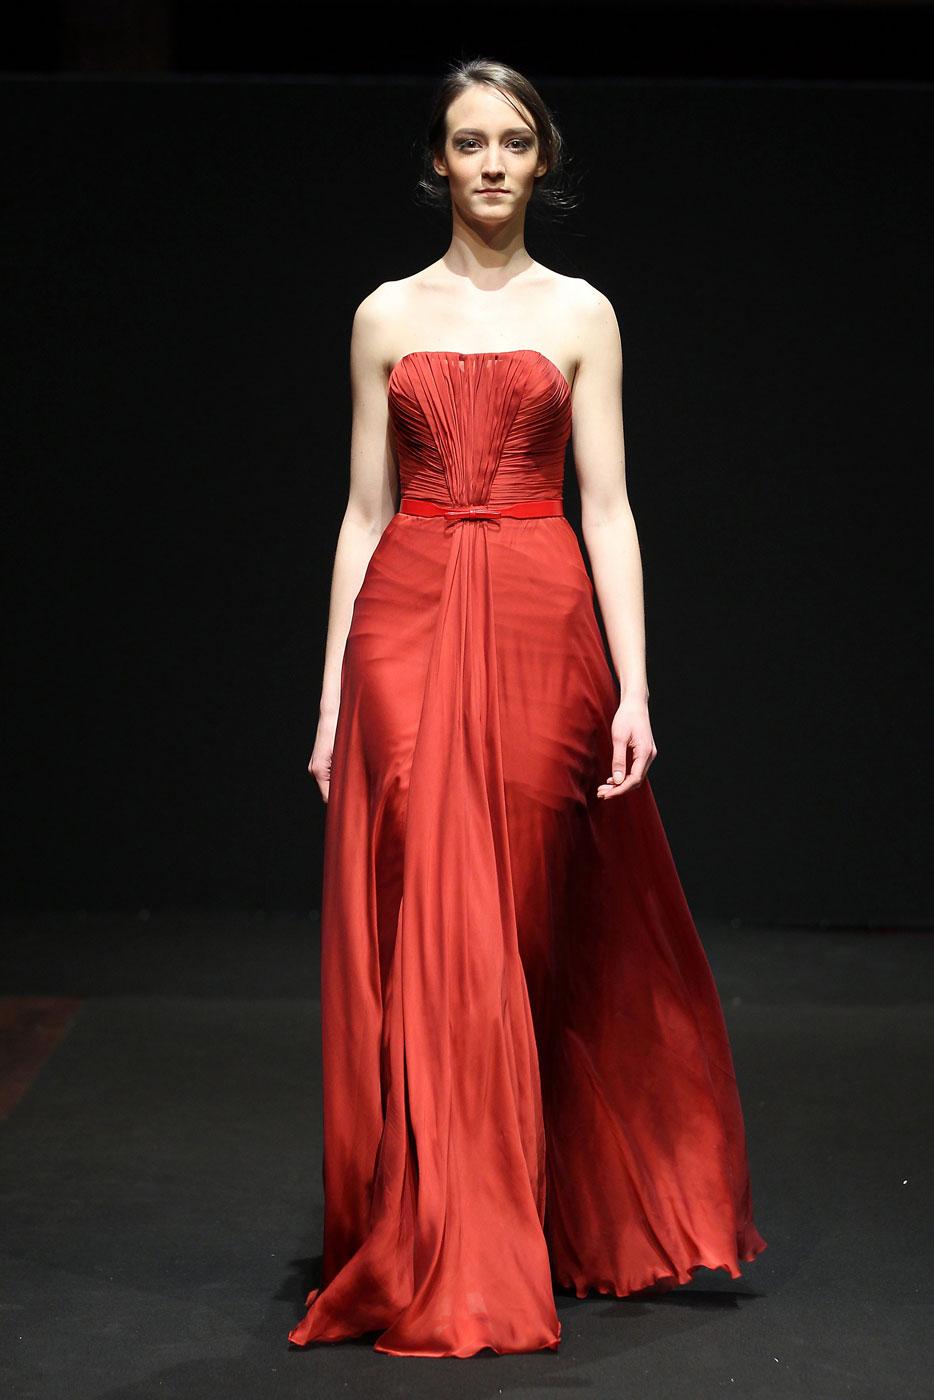 Abed-Mahfouz-fashion-runway-show-haute-couture-paris-spring-2015-the-impression-29